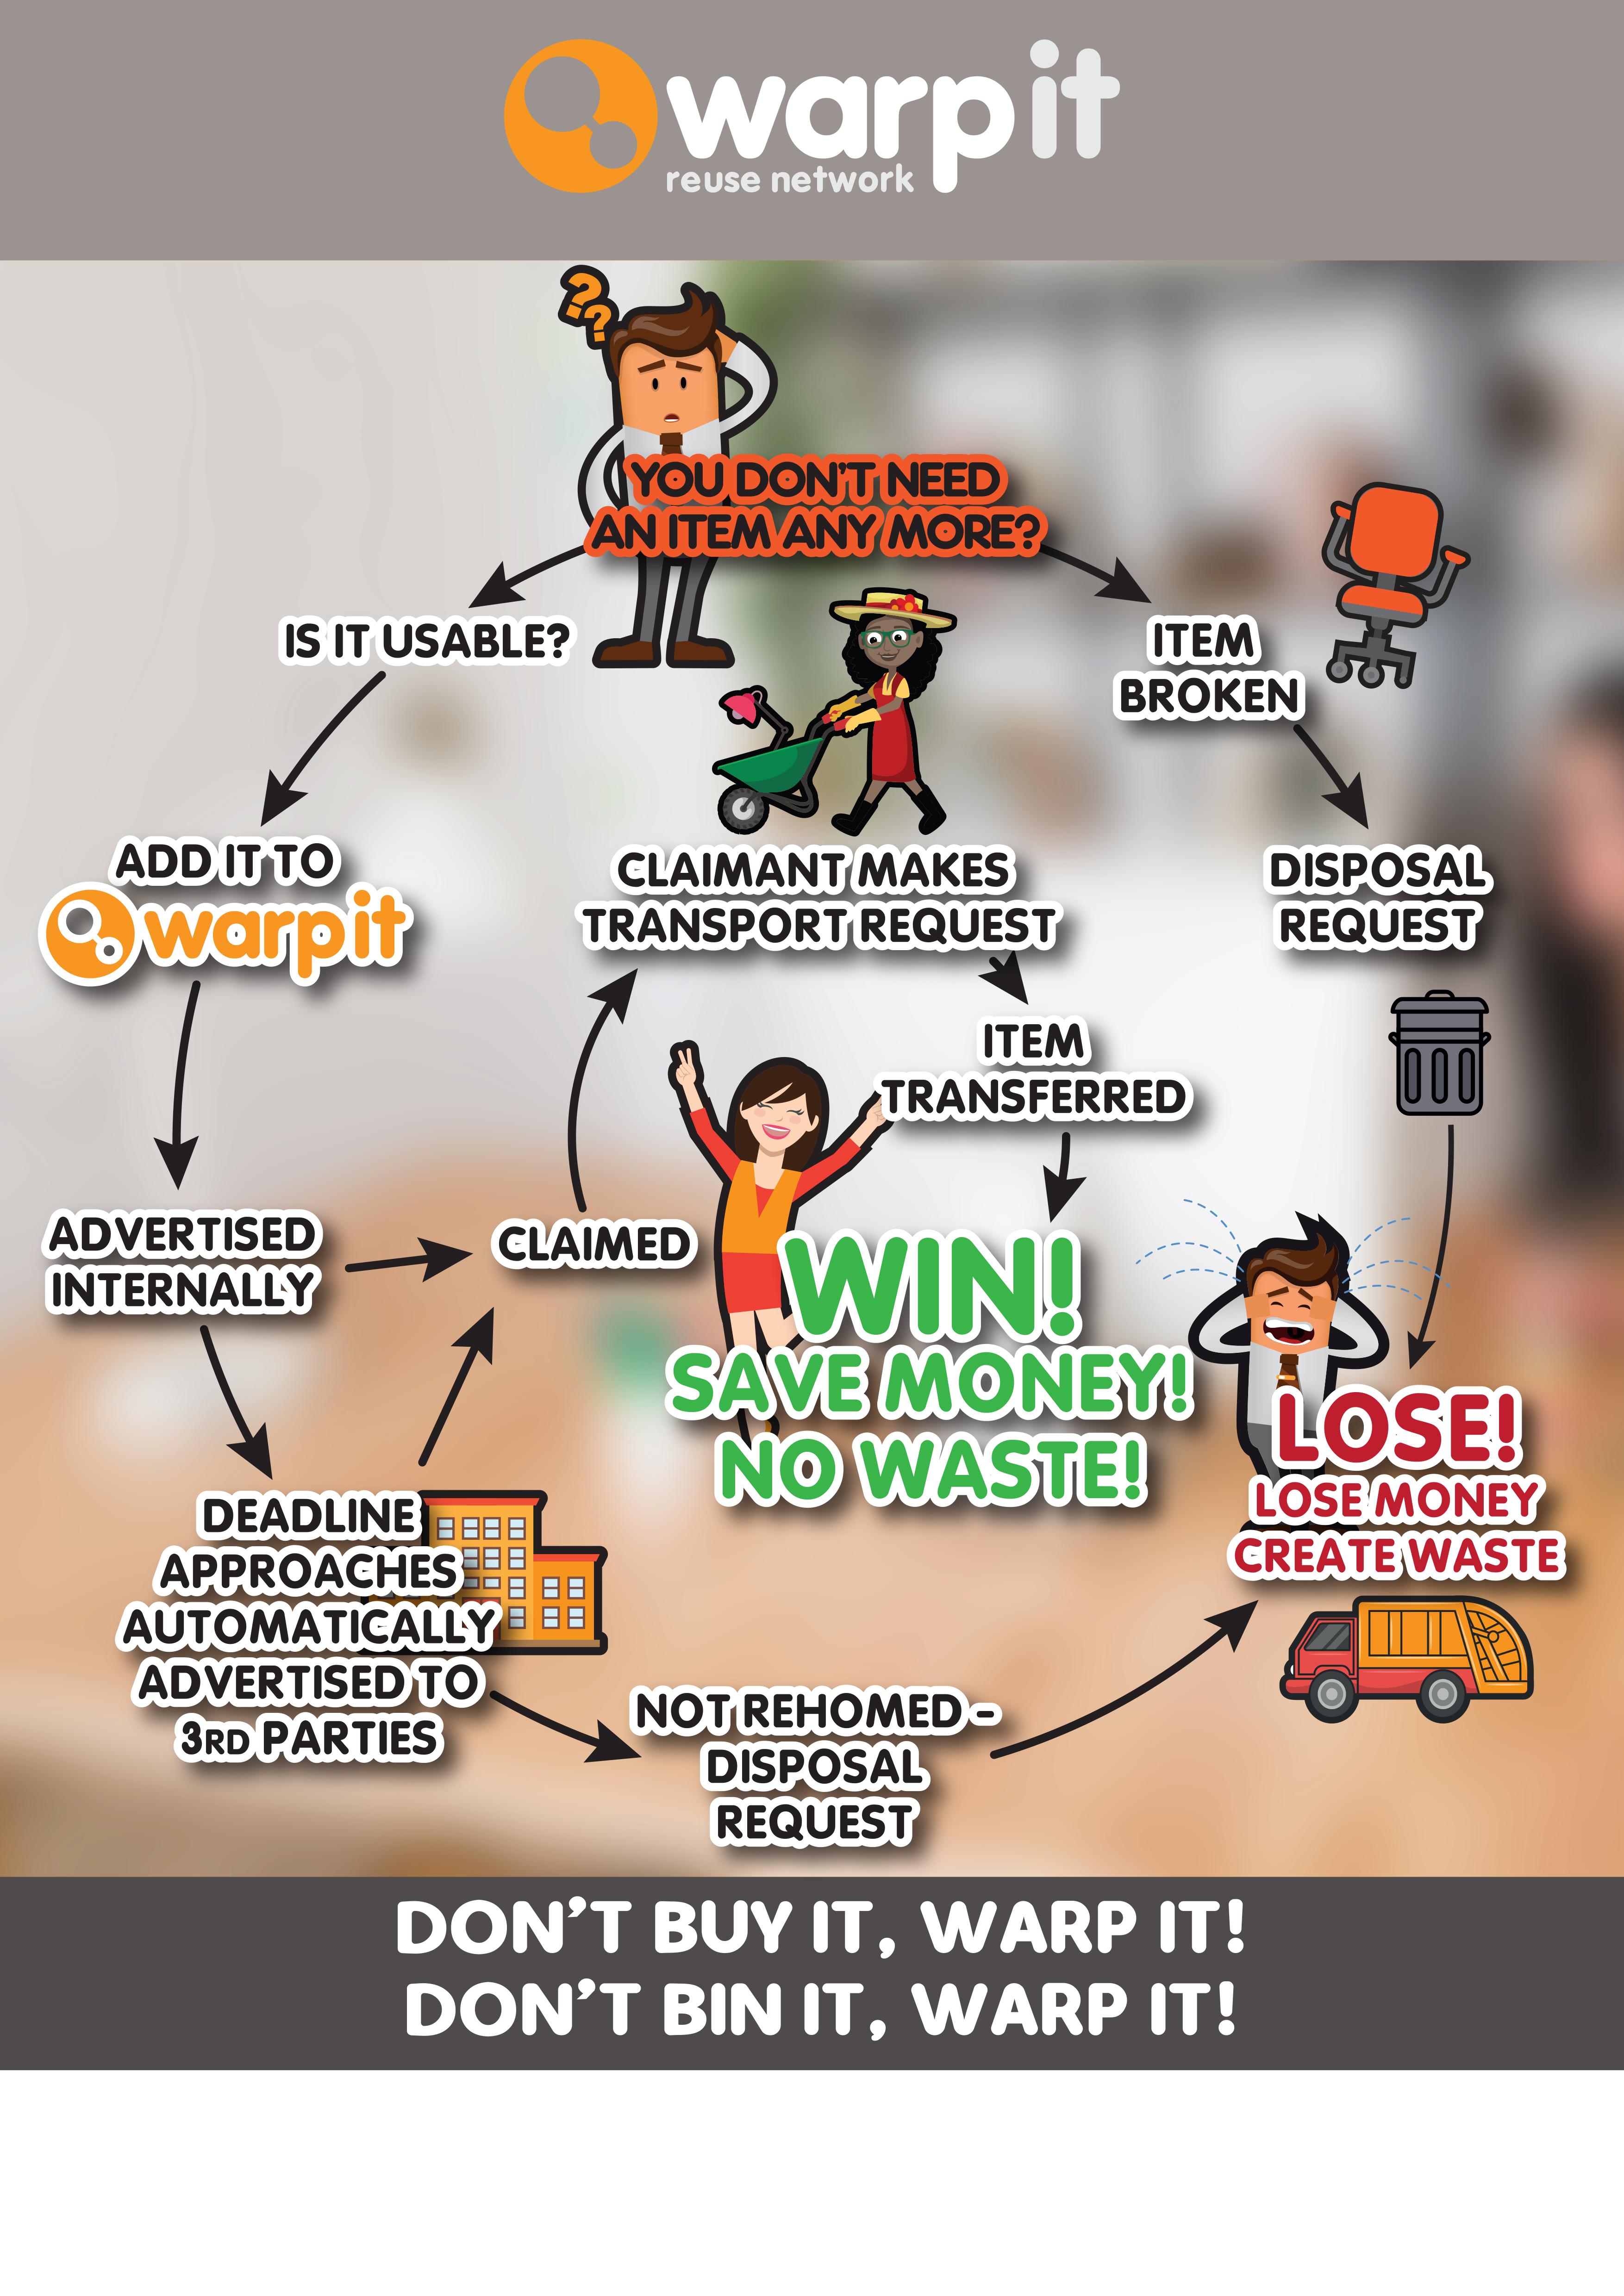 Warp-it-PROCESS.png